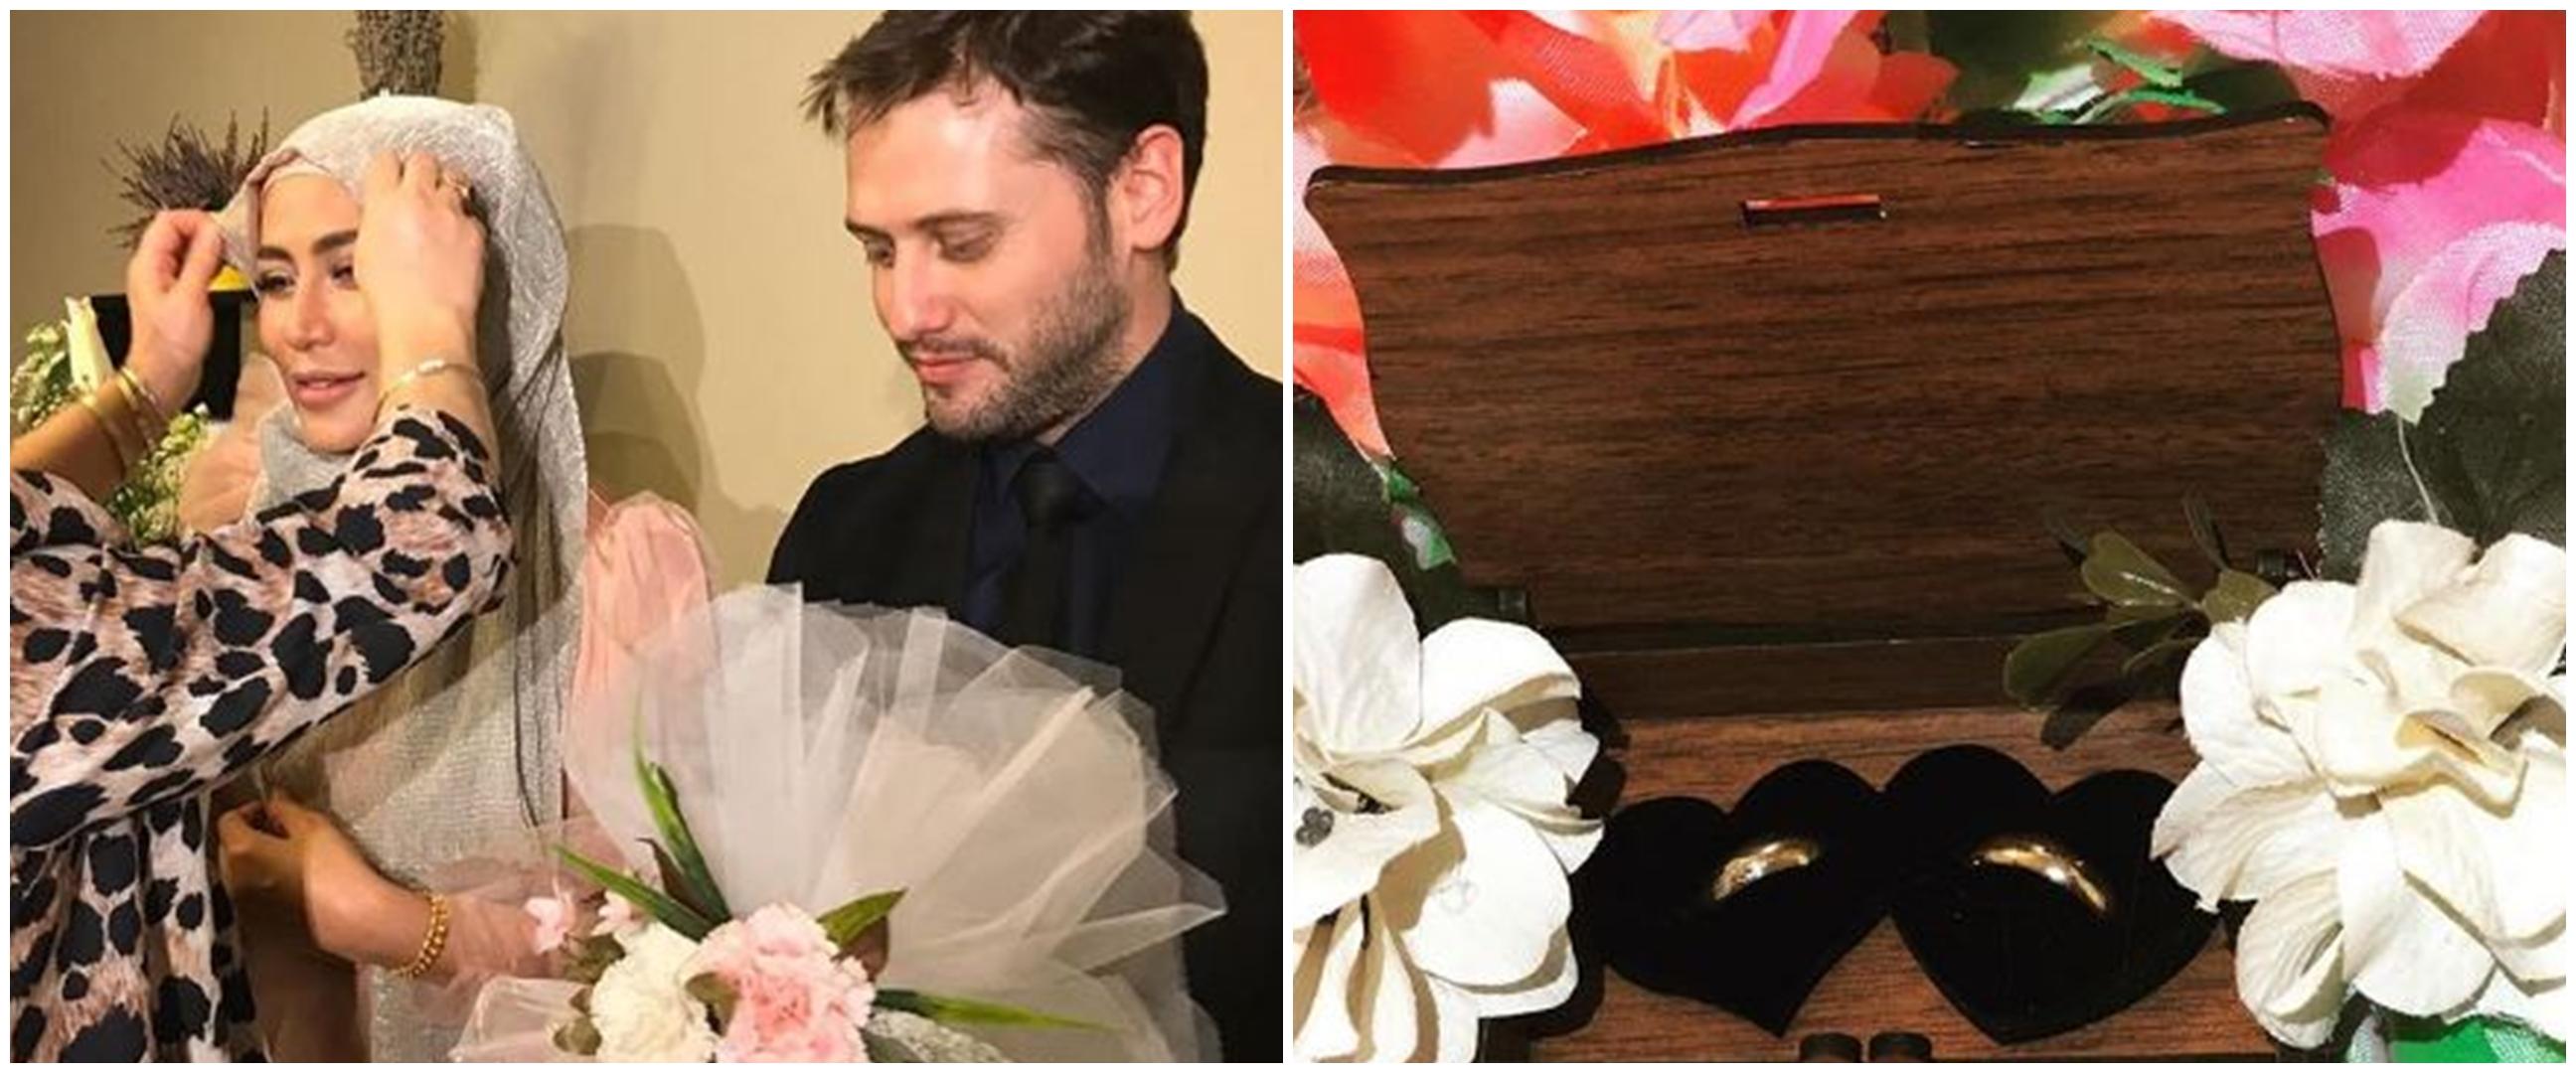 7 Momen Cinta Penelope & suami usai nikah, penuh kebahagiaan